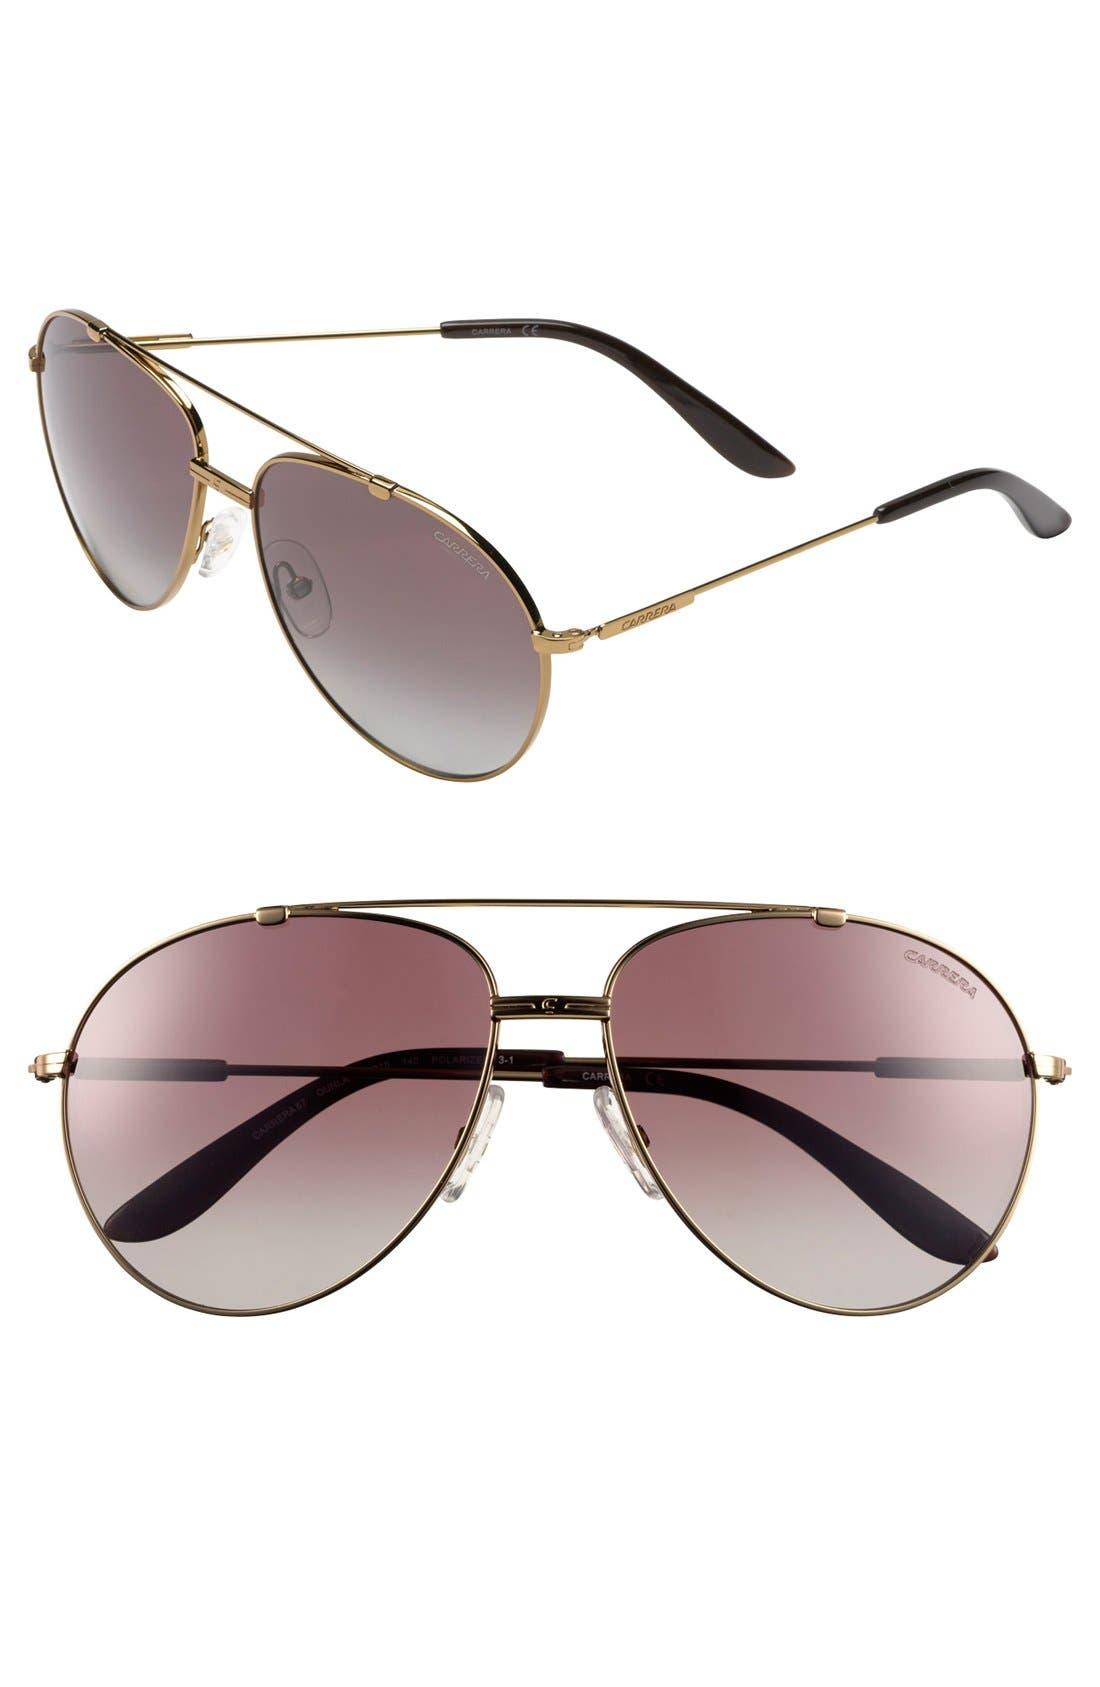 Alternate Image 1 Selected - Carrera Eyewear 60mm Polarized Aviator Sunglasses